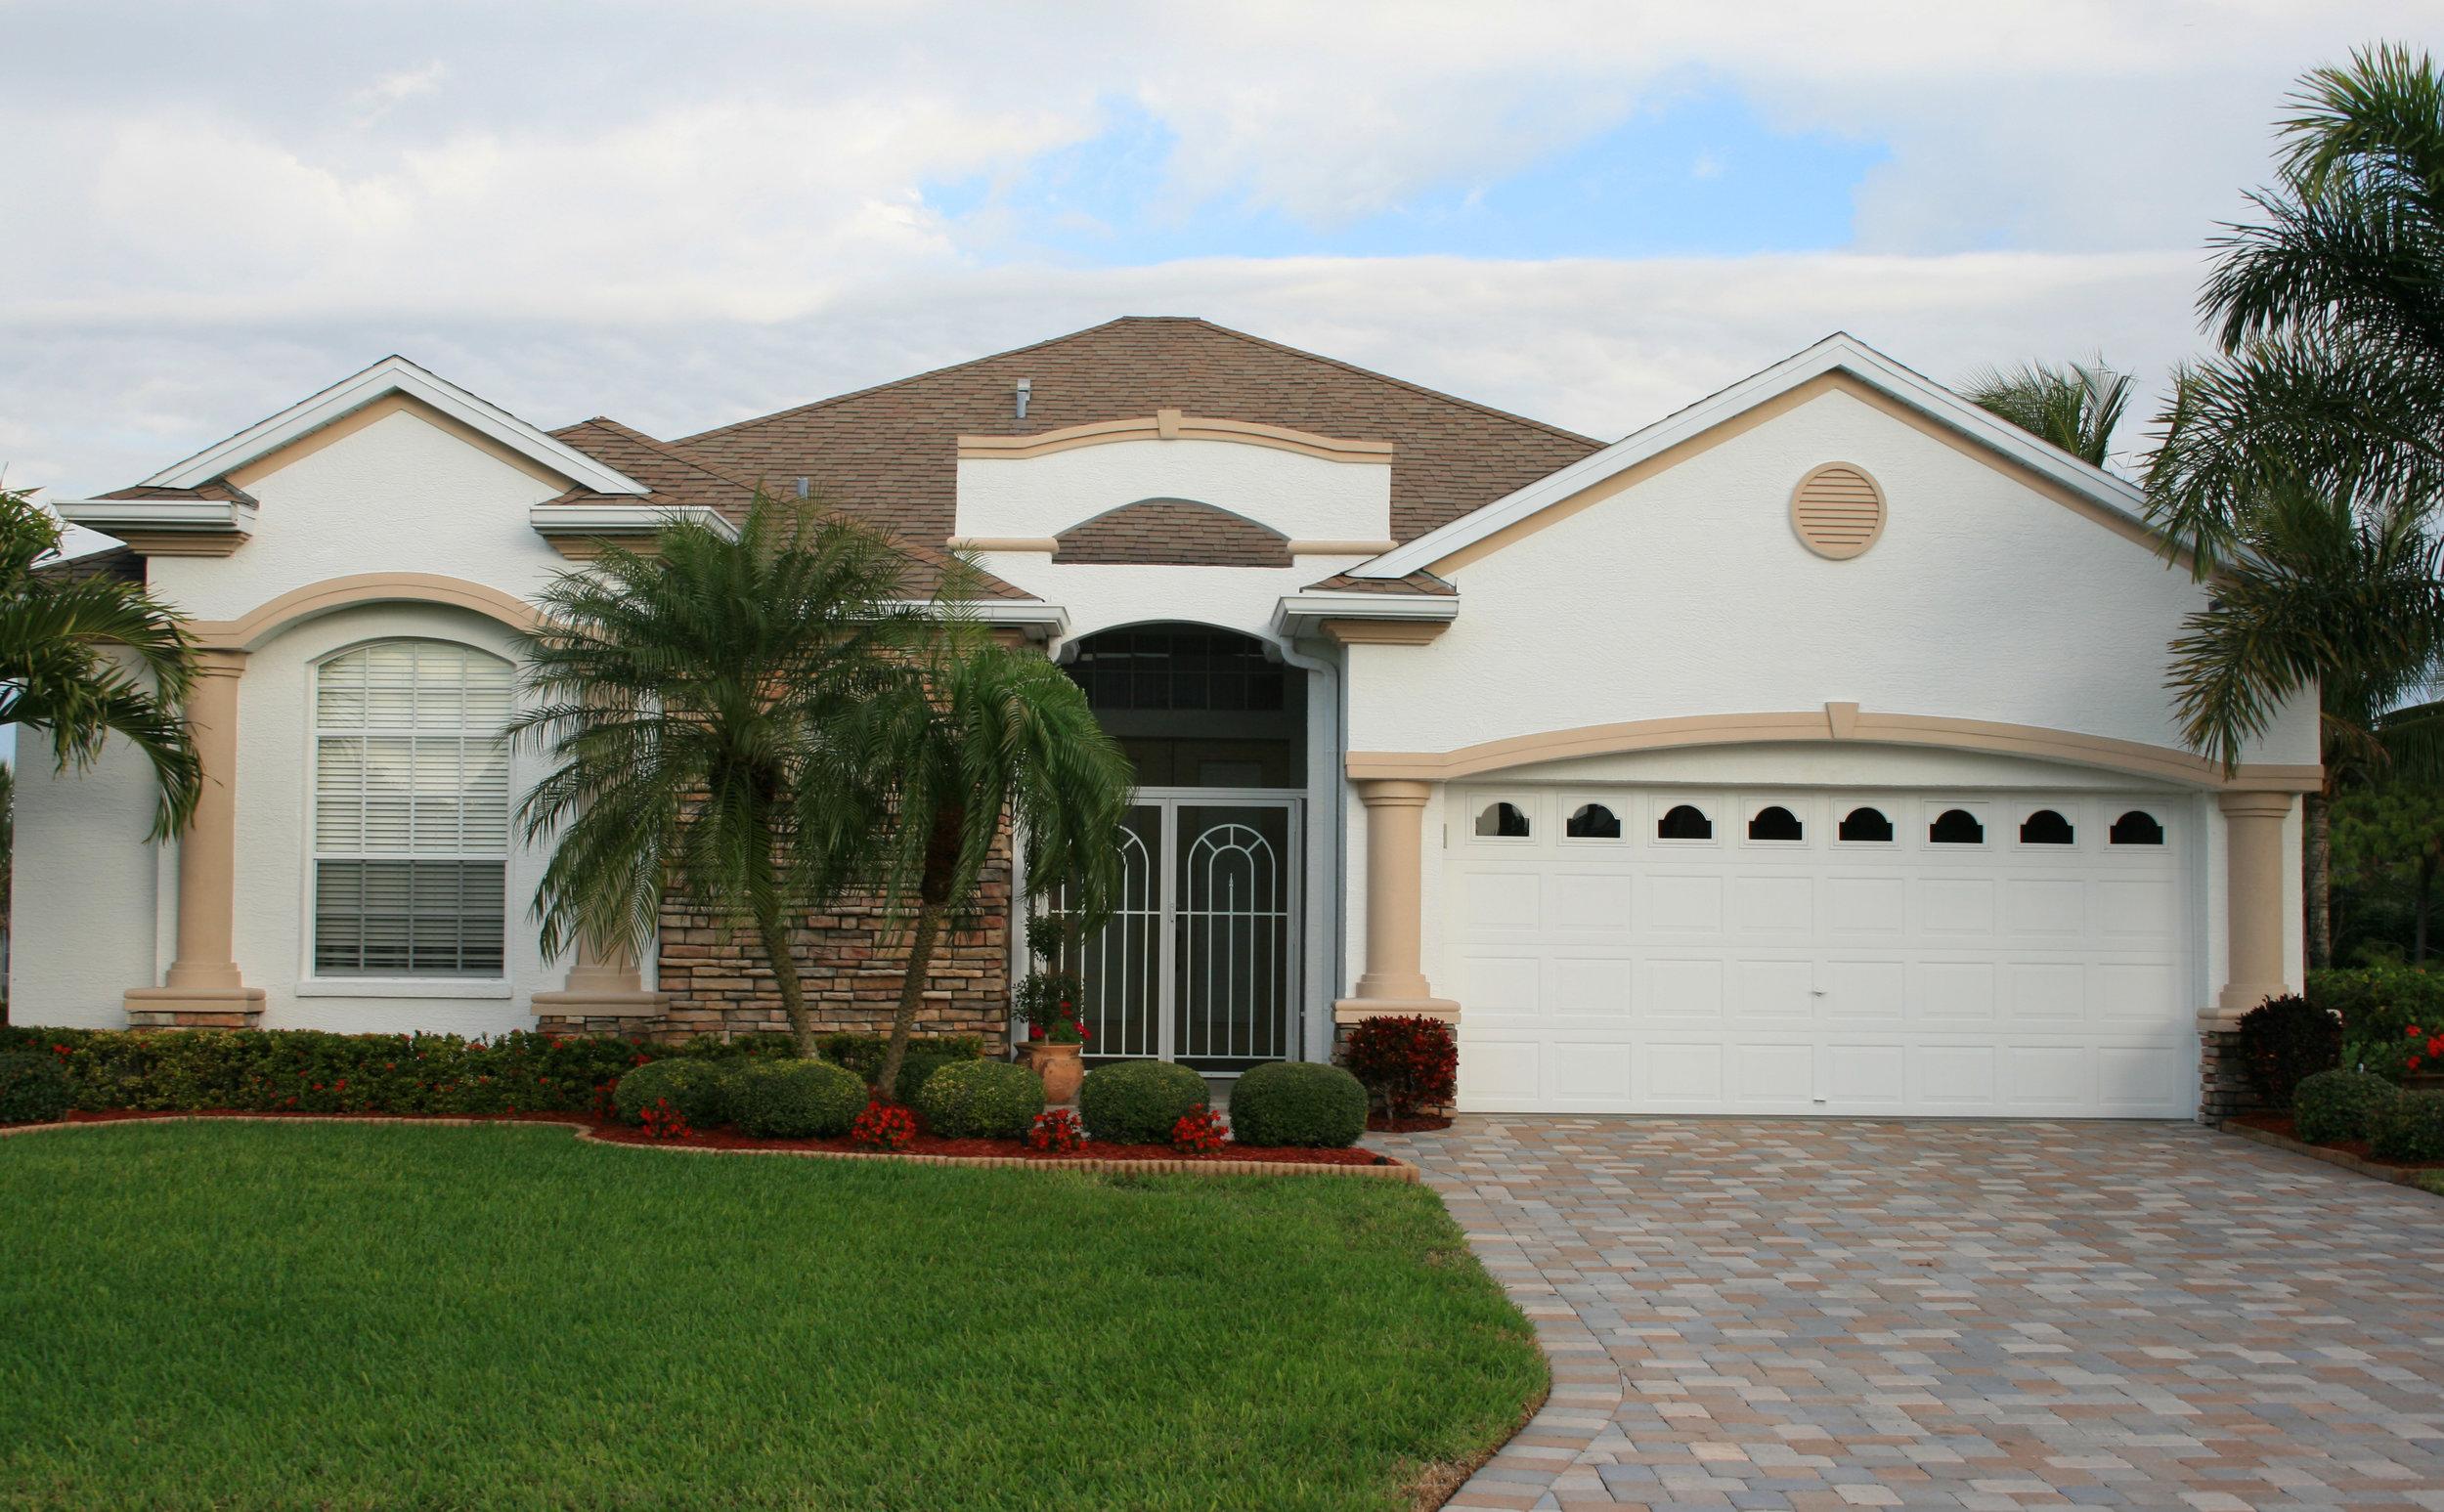 Joe-the-Home-Pro-Fort-Myers-Beach-Florida-Home-photo